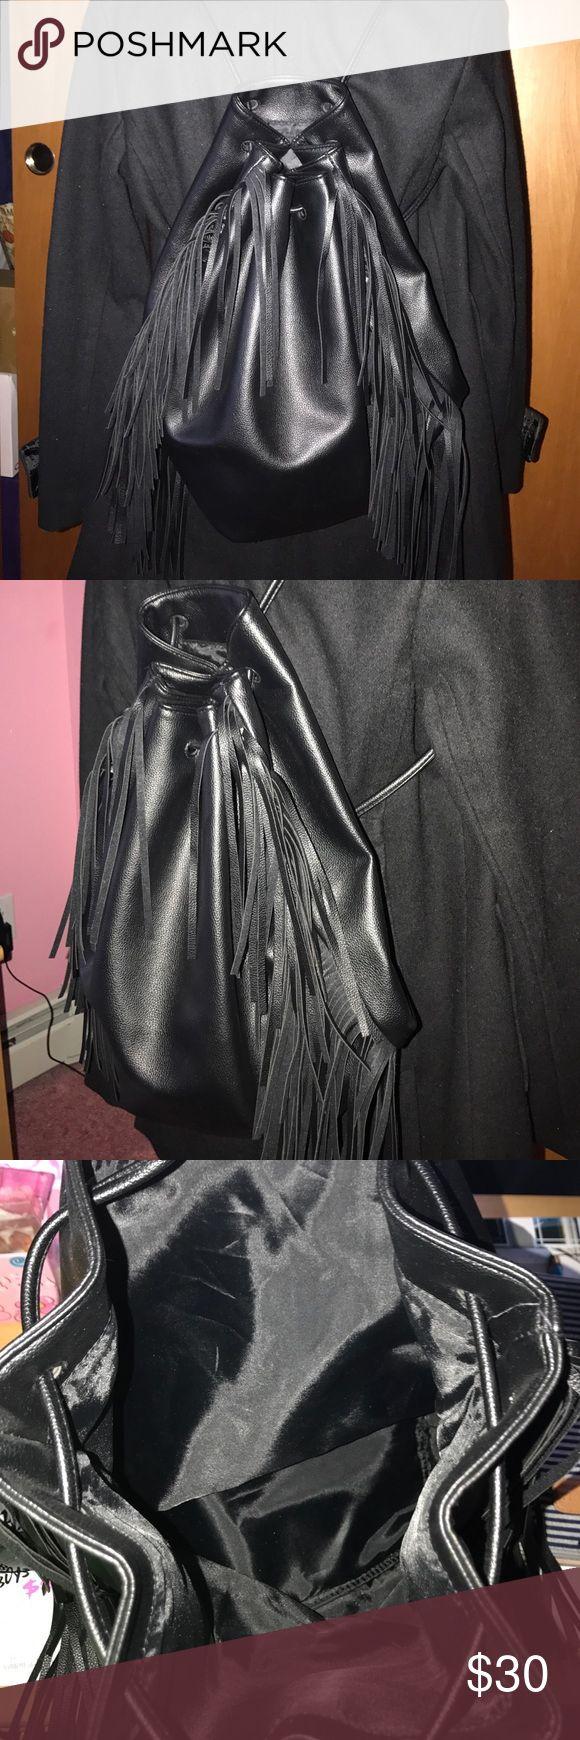 Selling this Victoria Secret string backpack - black on Poshmark! My username is: ninarampulla. #shopmycloset #poshmark #fashion #shopping #style #forsale #Victoria's Secret #Handbags